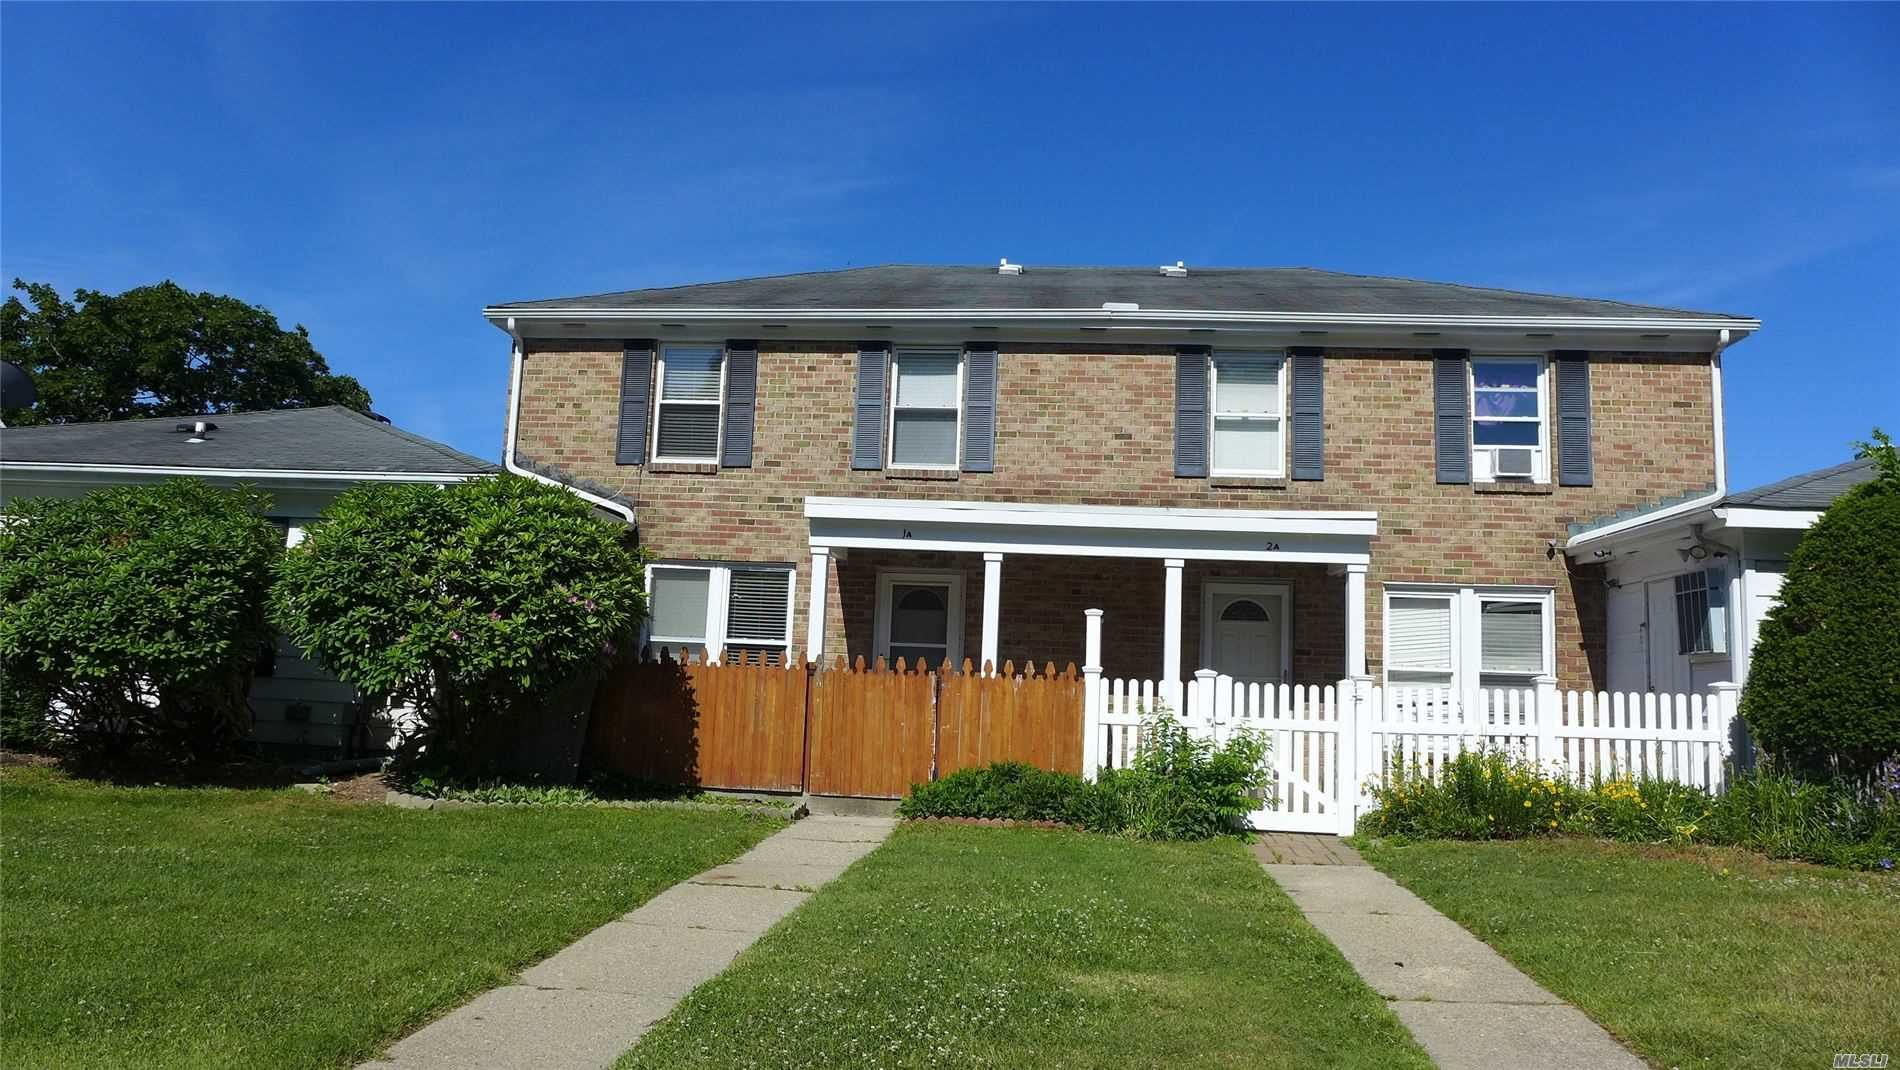 1A Pioneer Court, Ridge, NY 11961 - MLS#: 3223750